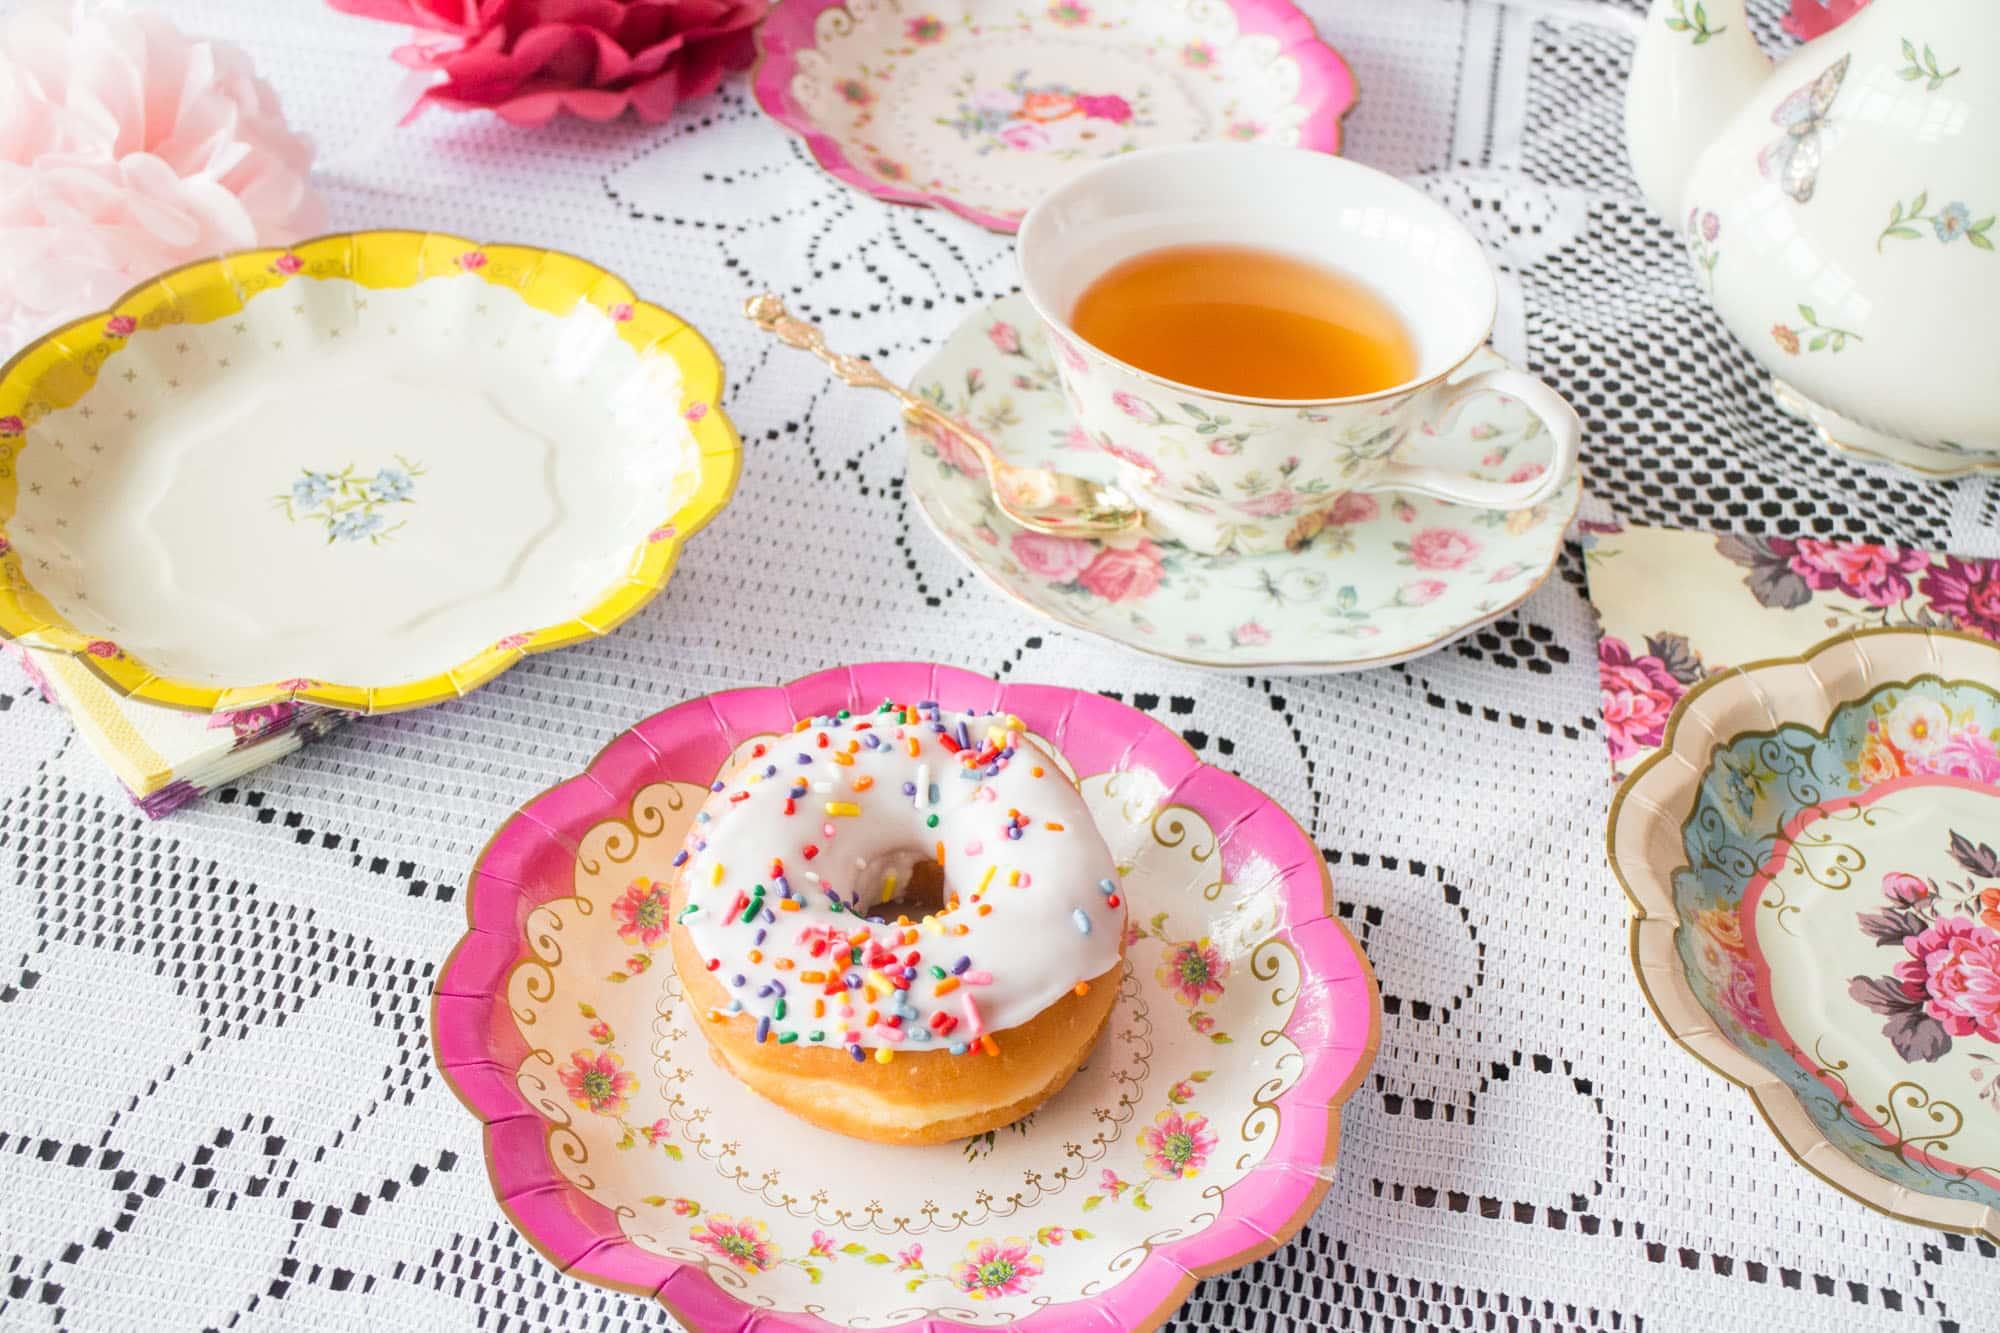 Teaparty: How To Throw A Tea Party